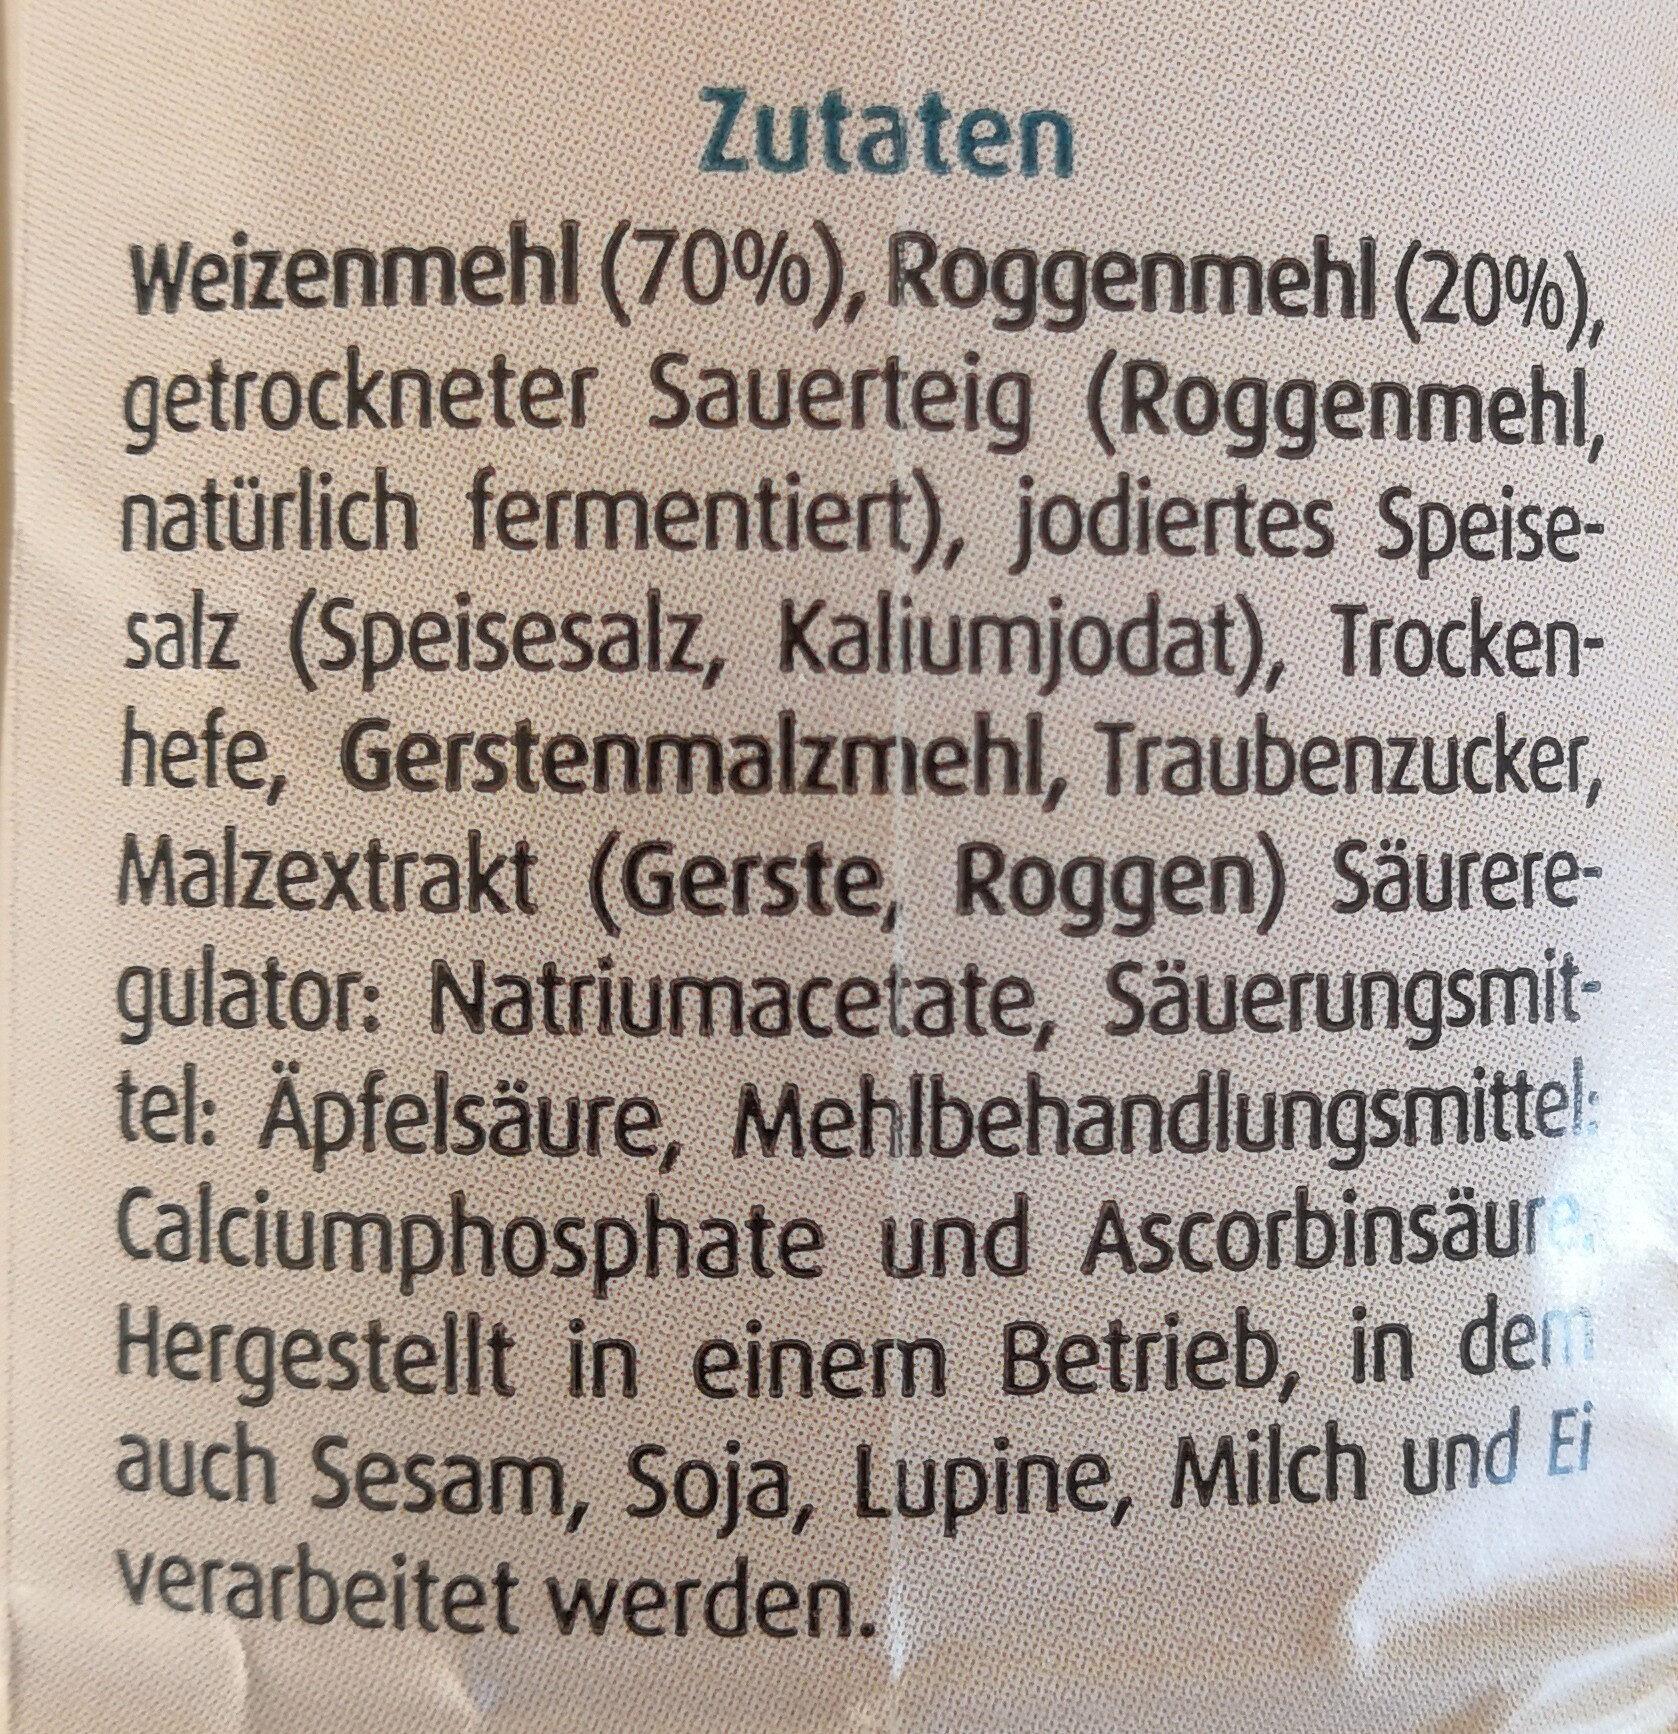 Bauernbrot Backmischung - Ingrédients - de